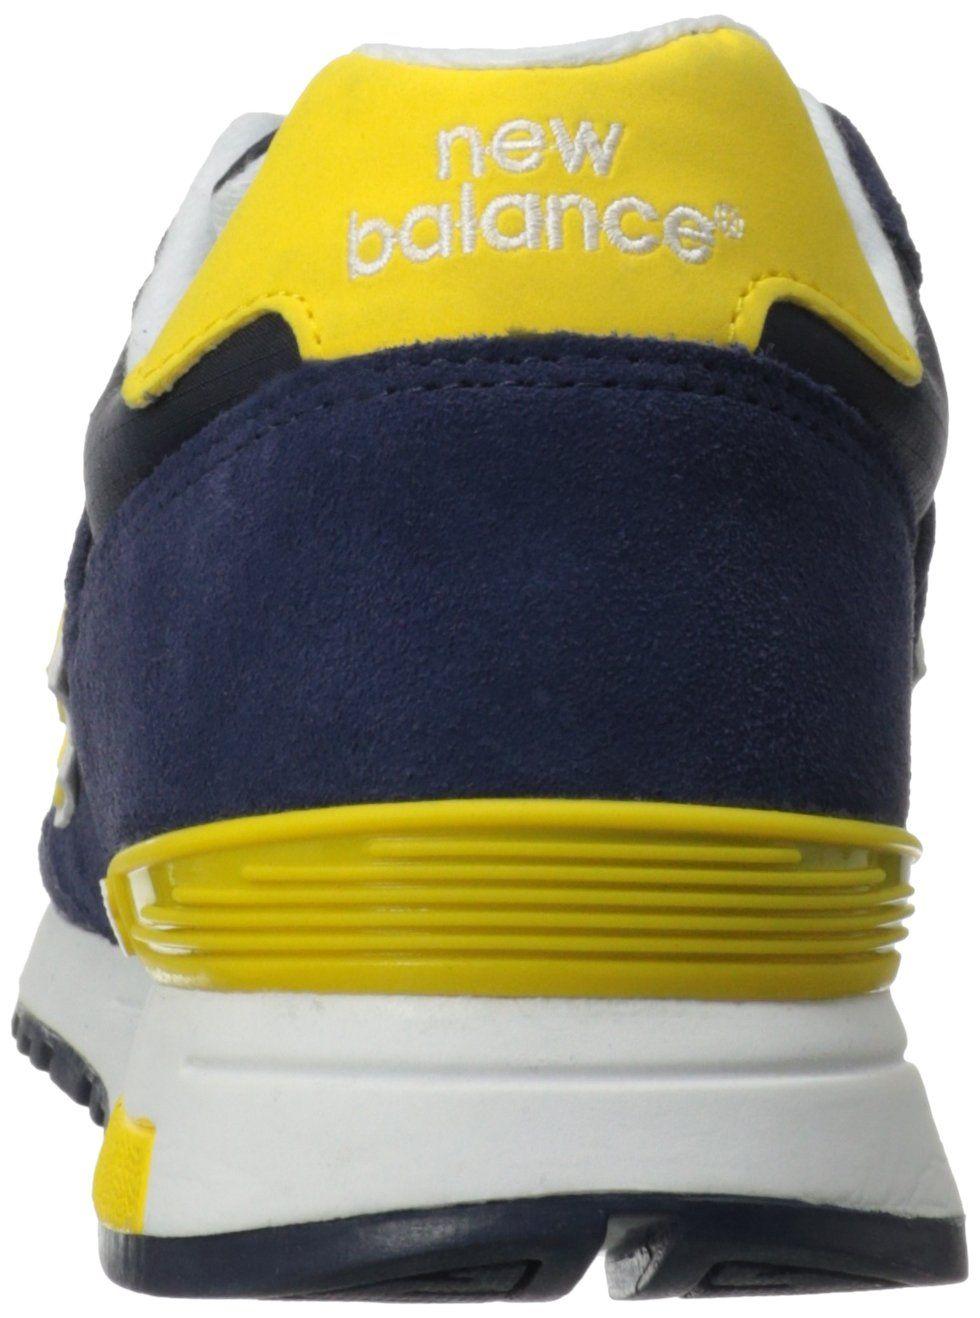 12cd9ab8f831a Amazon.com: New Balance Men's ML565 Classic Running Shoe: Clothing ...